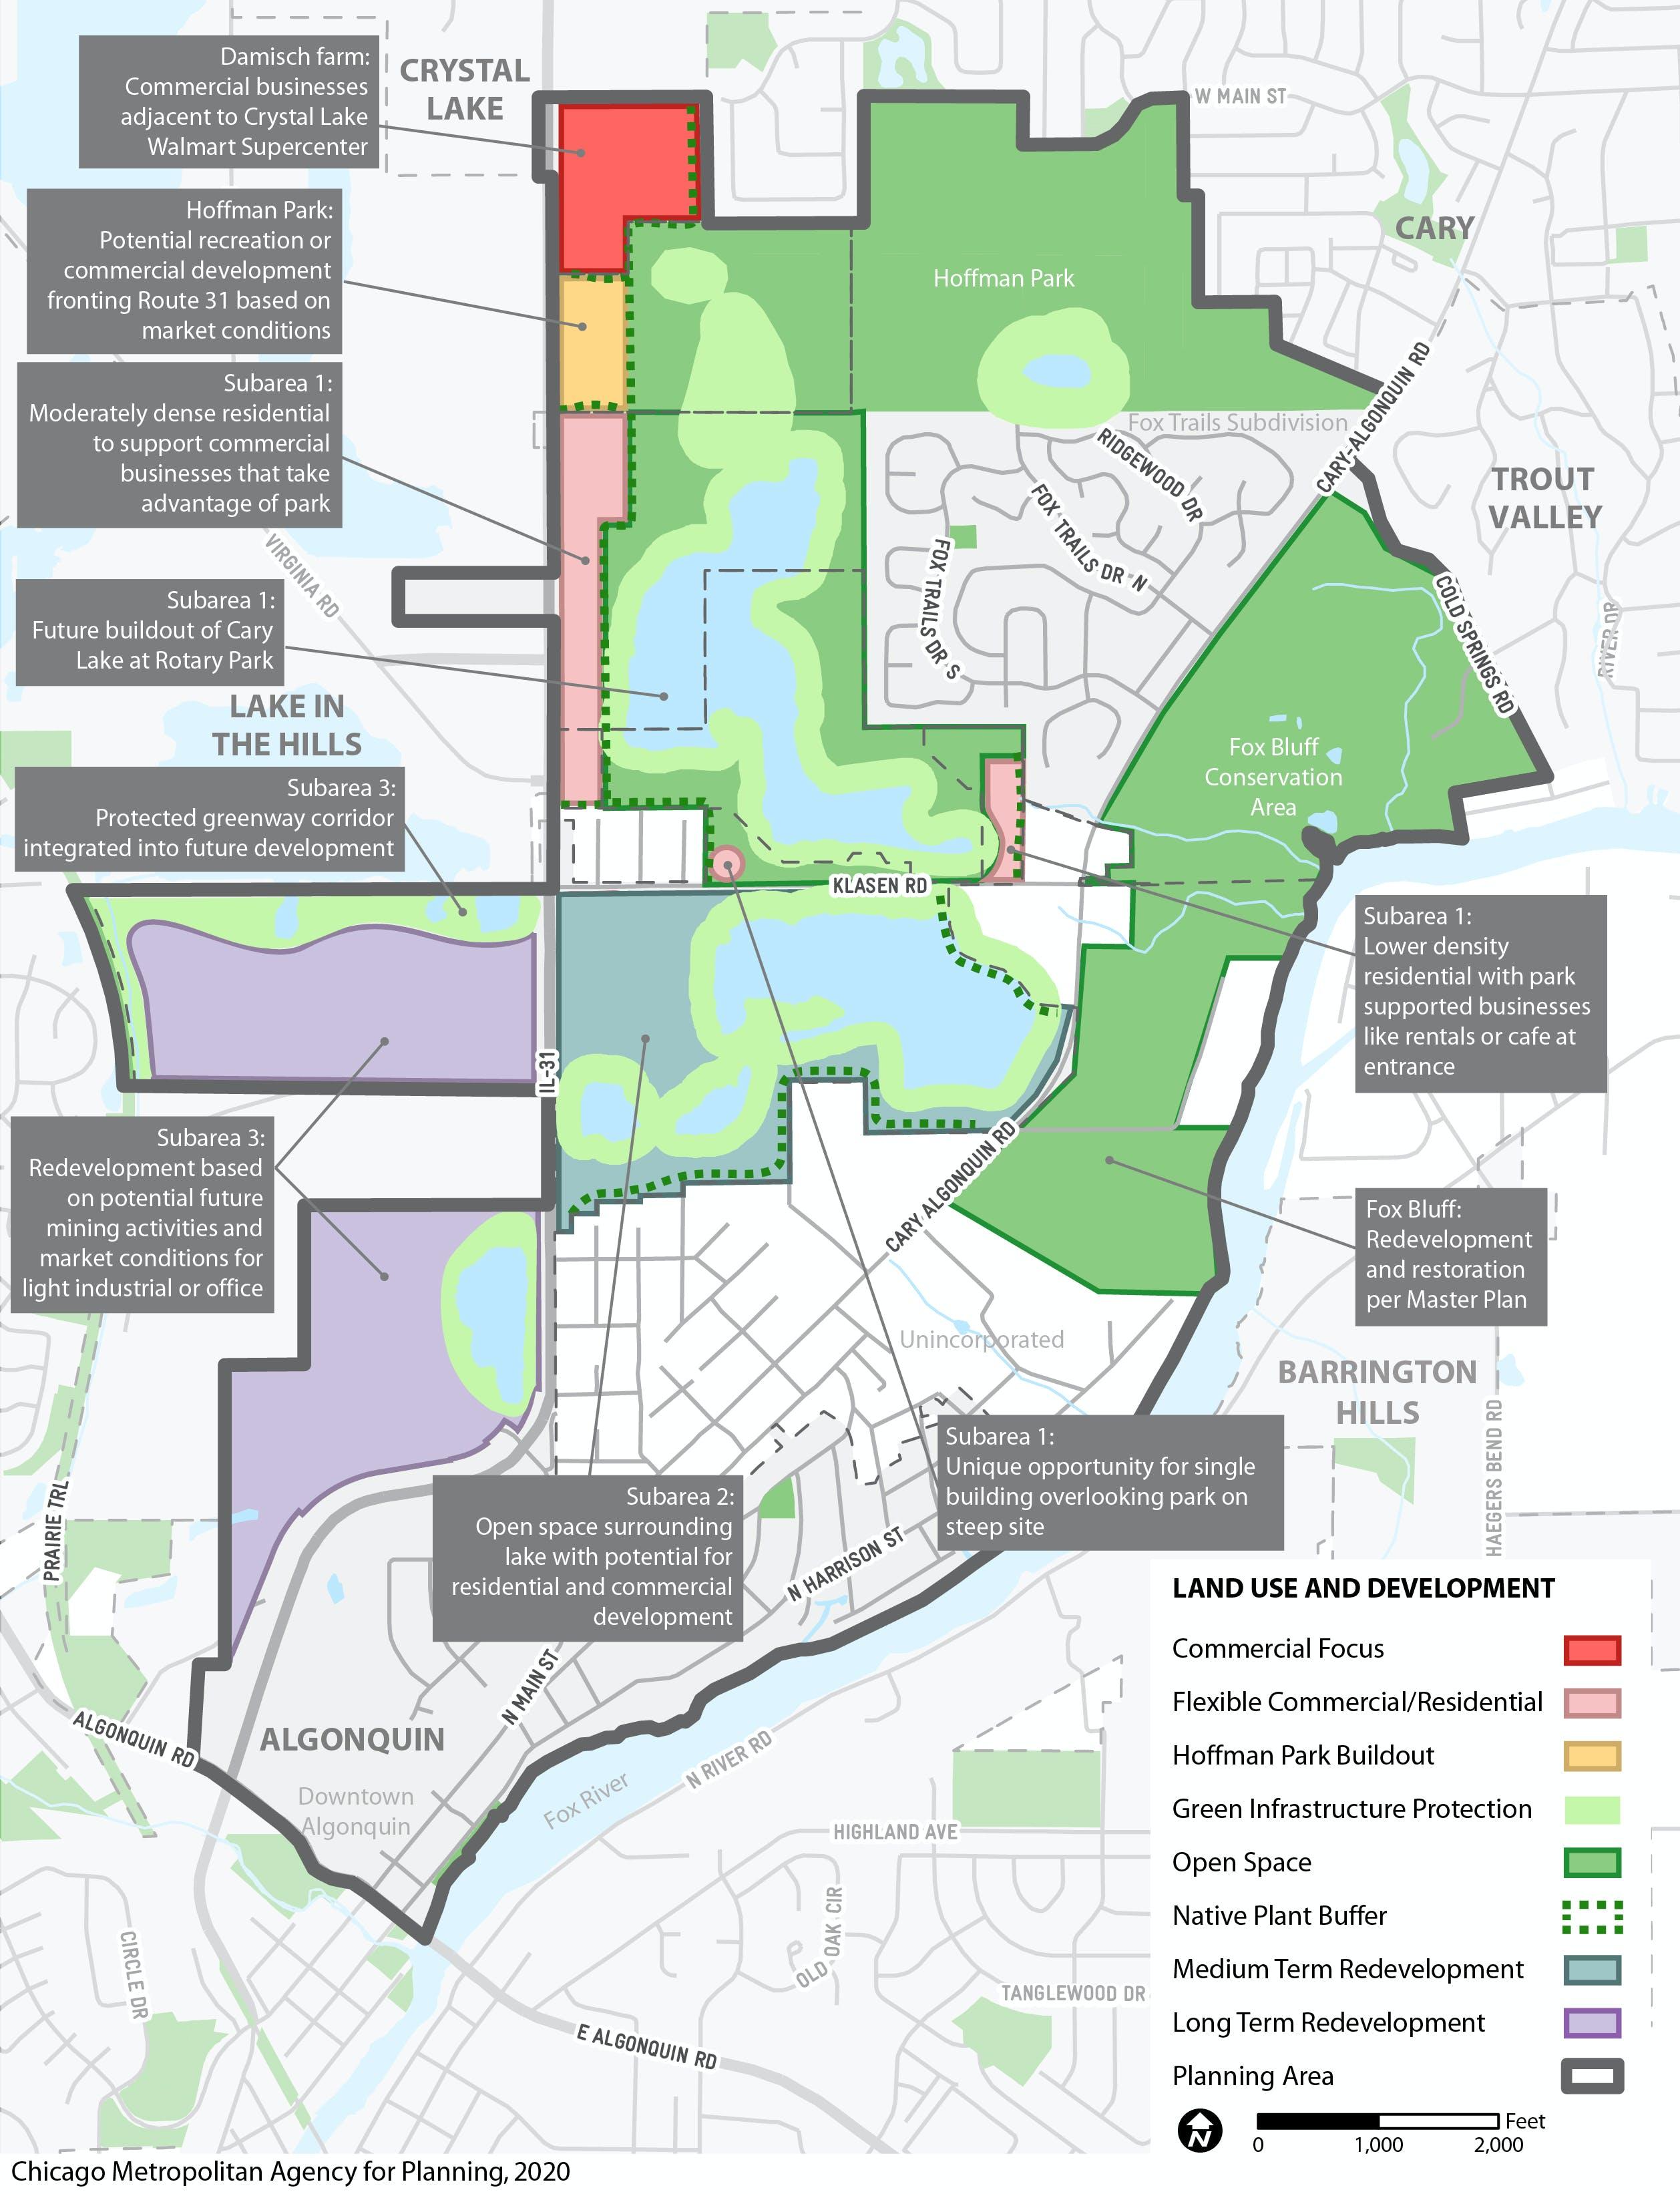 Land Use and Development plan